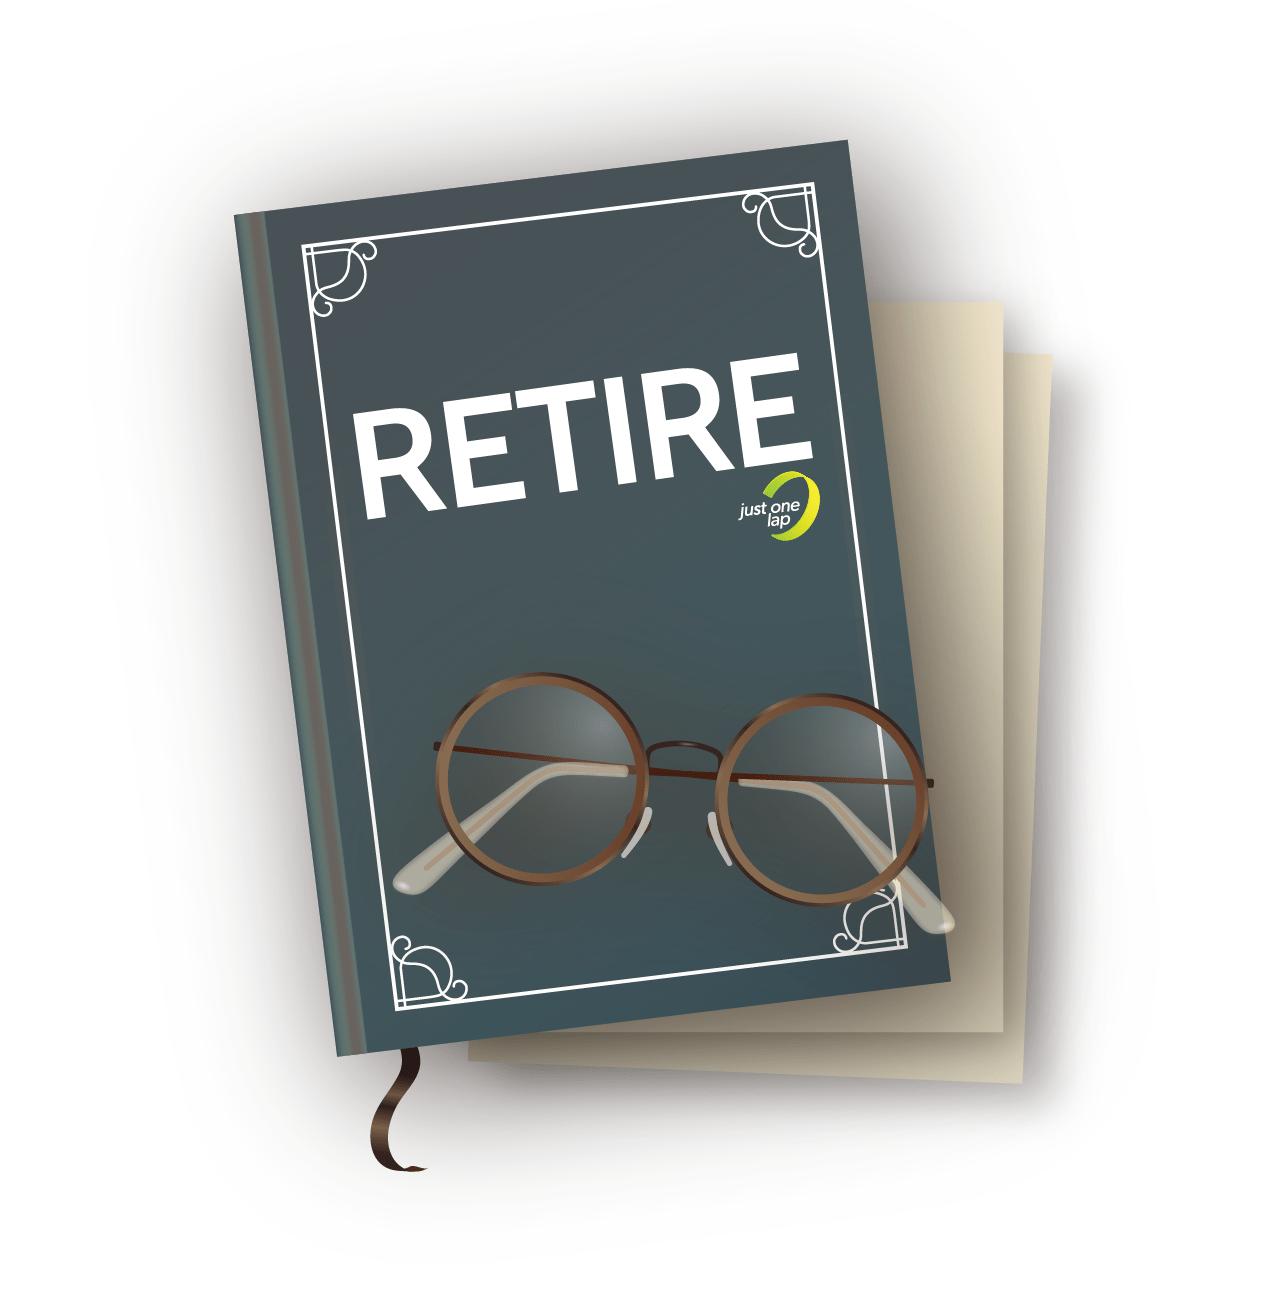 Retire: Next stop – retirement